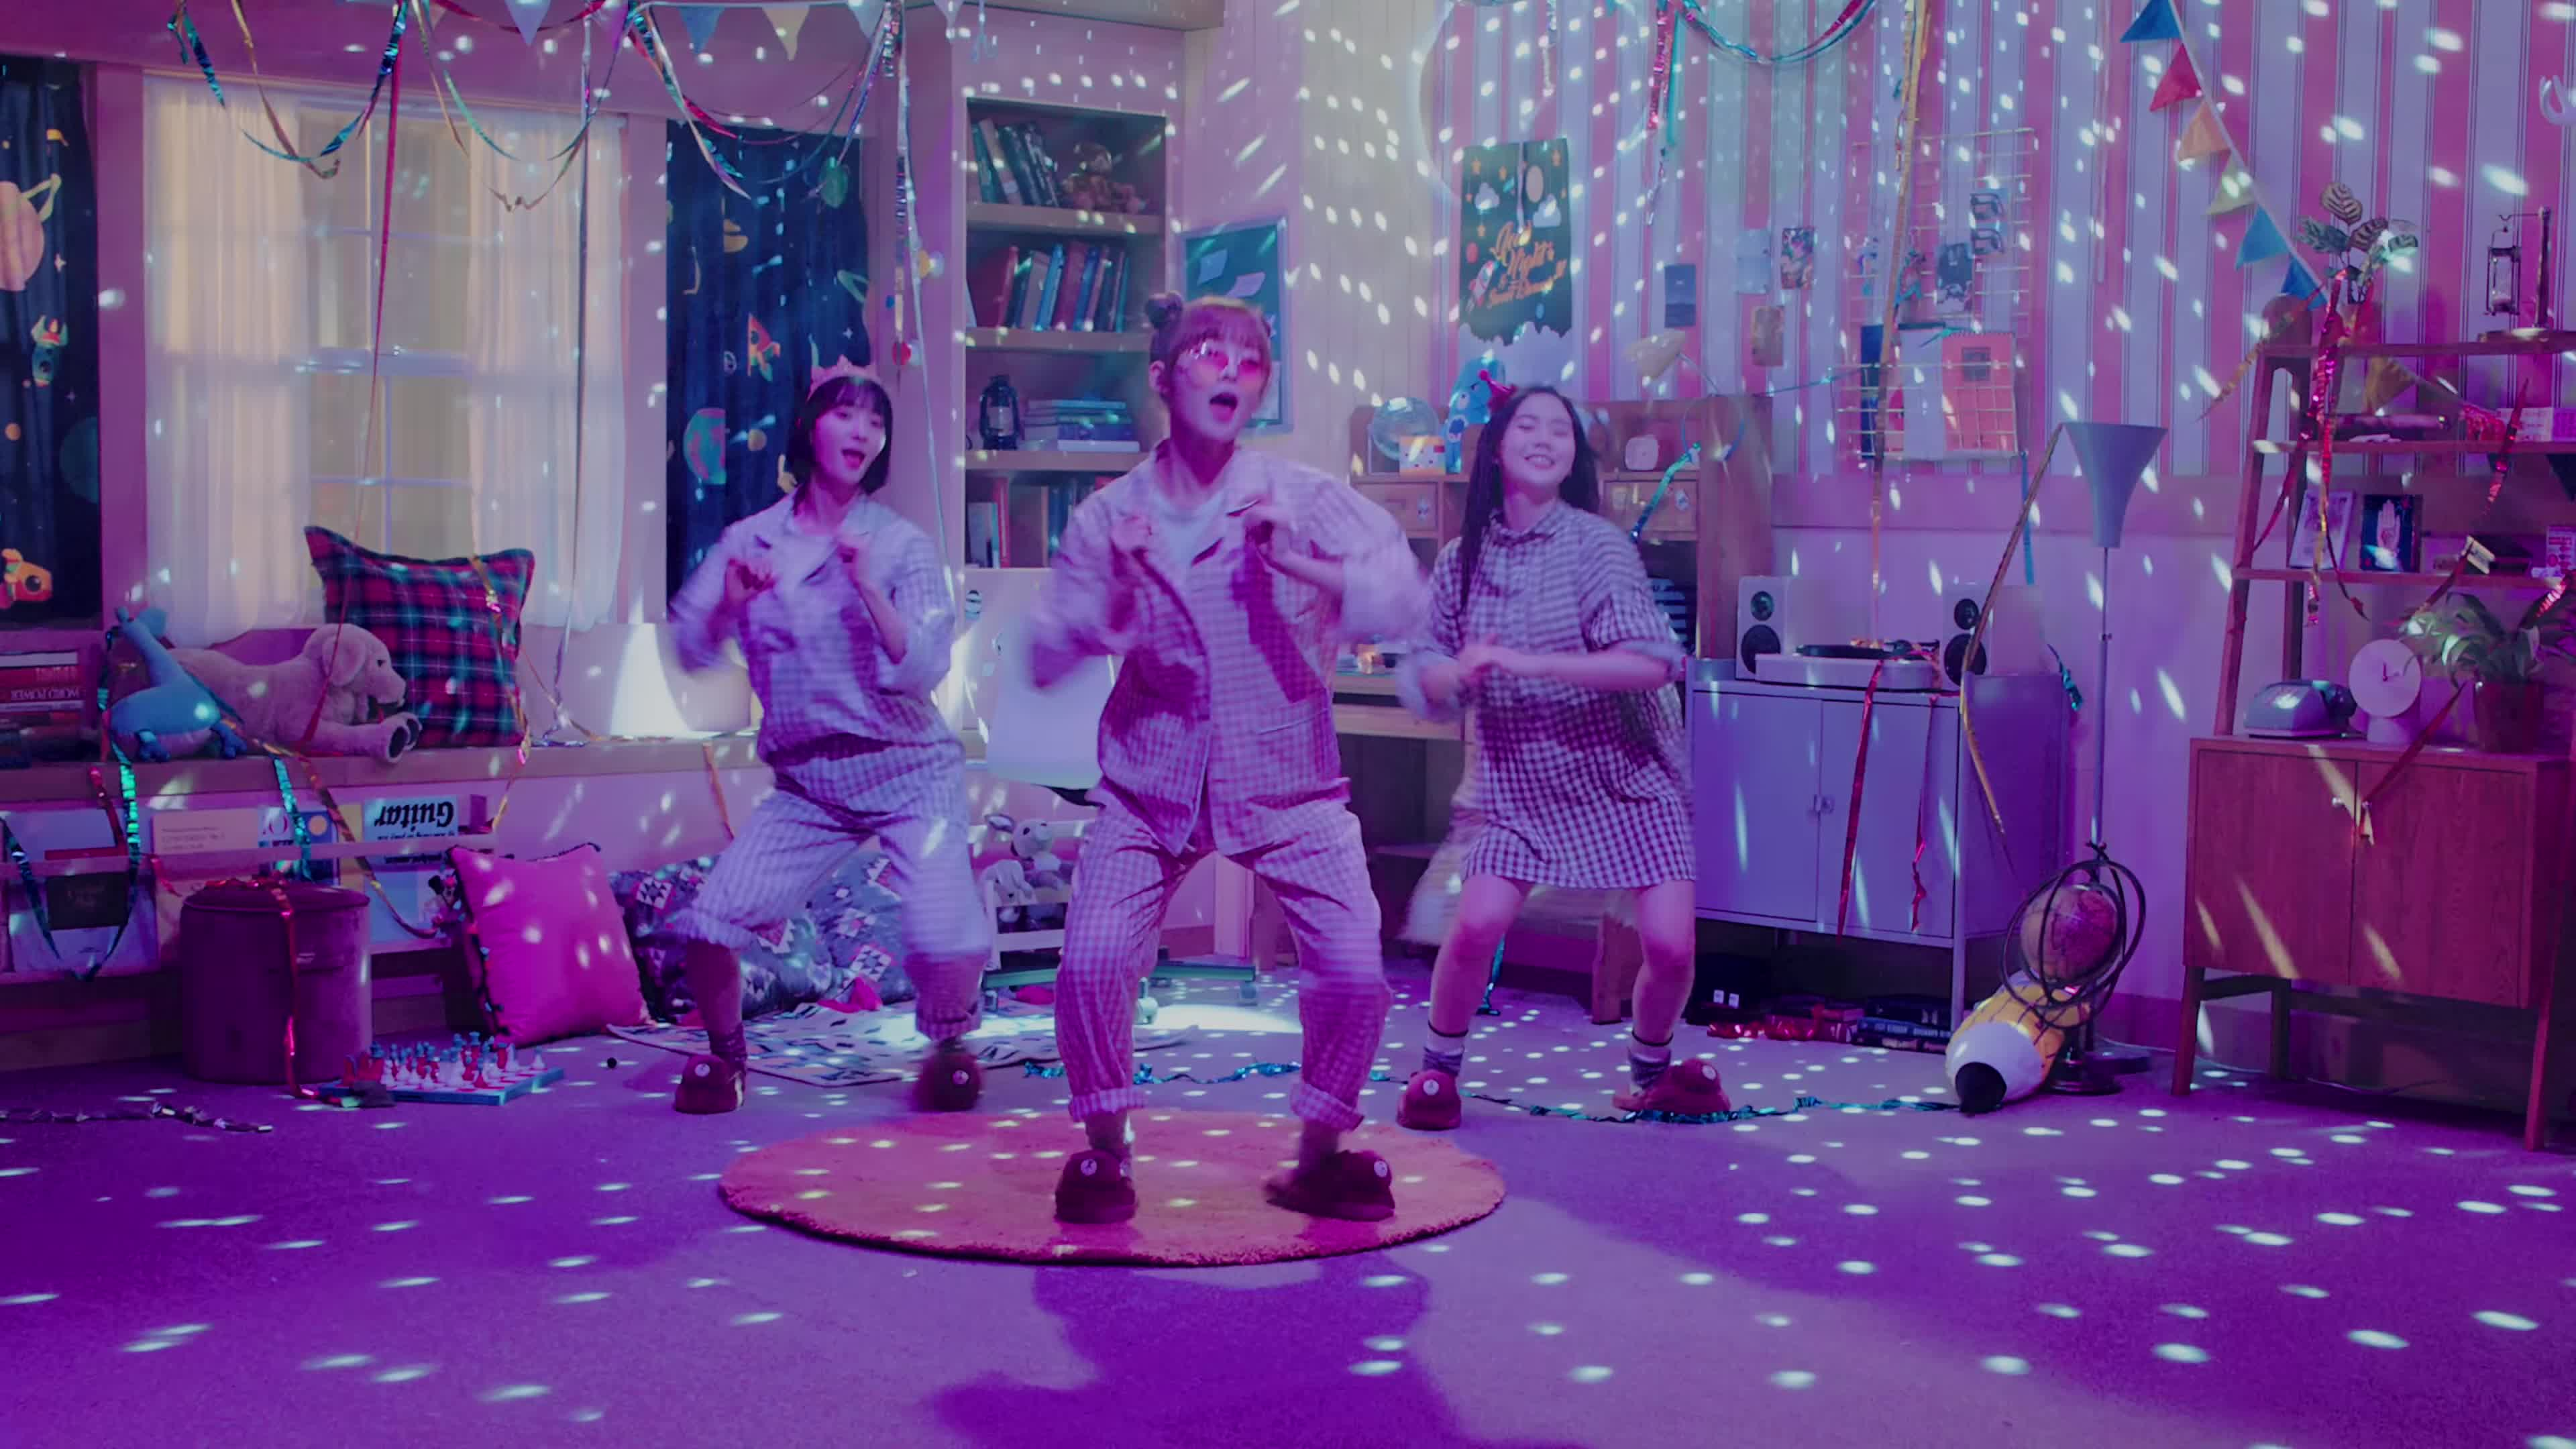 1theK, arin, binnie, hyojung, kpop, banana allergy GIFs